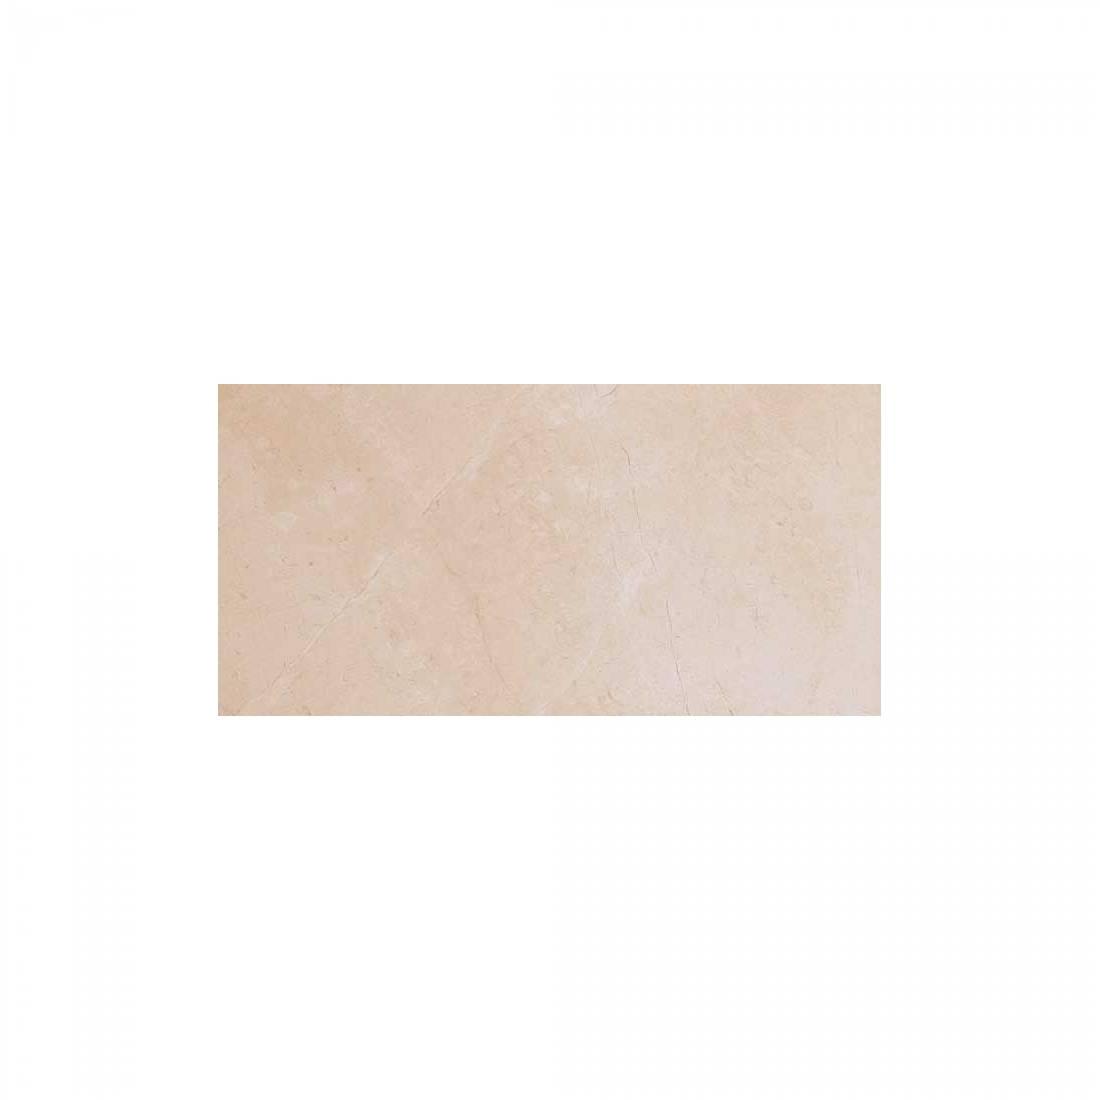 Caliza 30x60 Sand Gloss 1